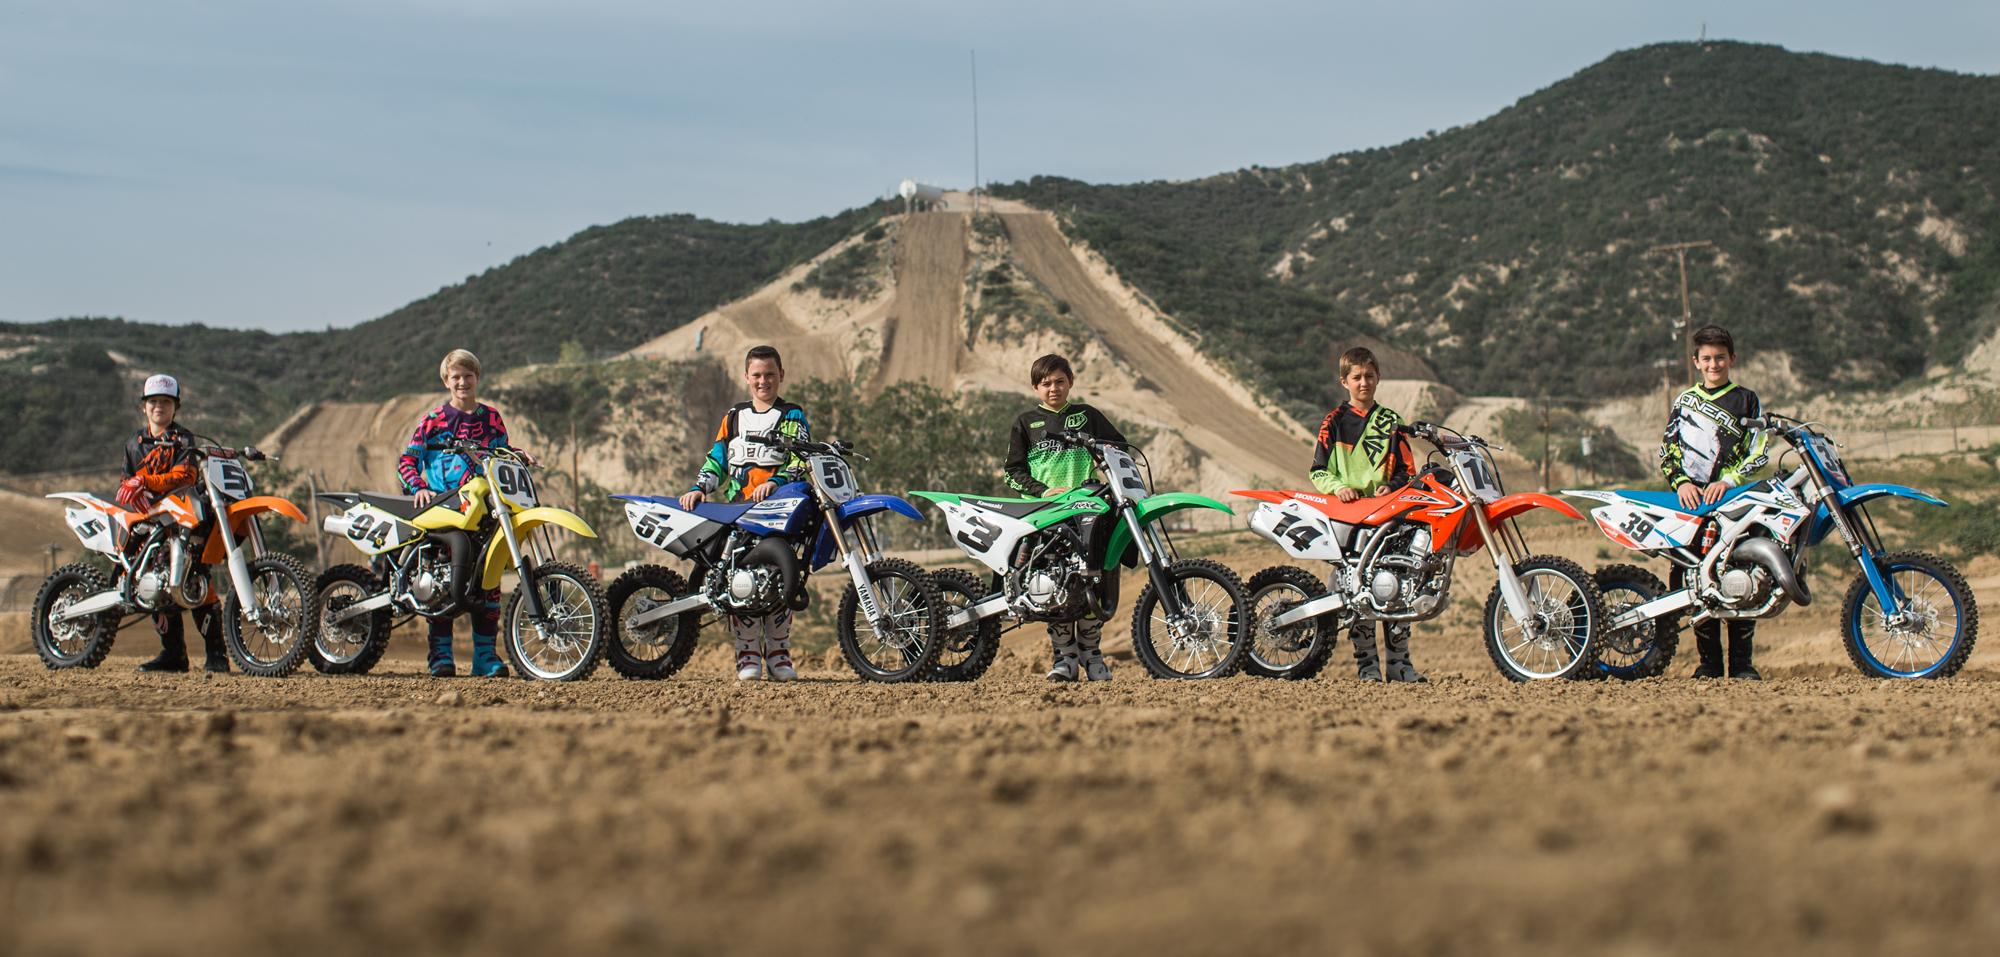 2016 Dirt Rider 85cc MX Shootout | Dirt Rider